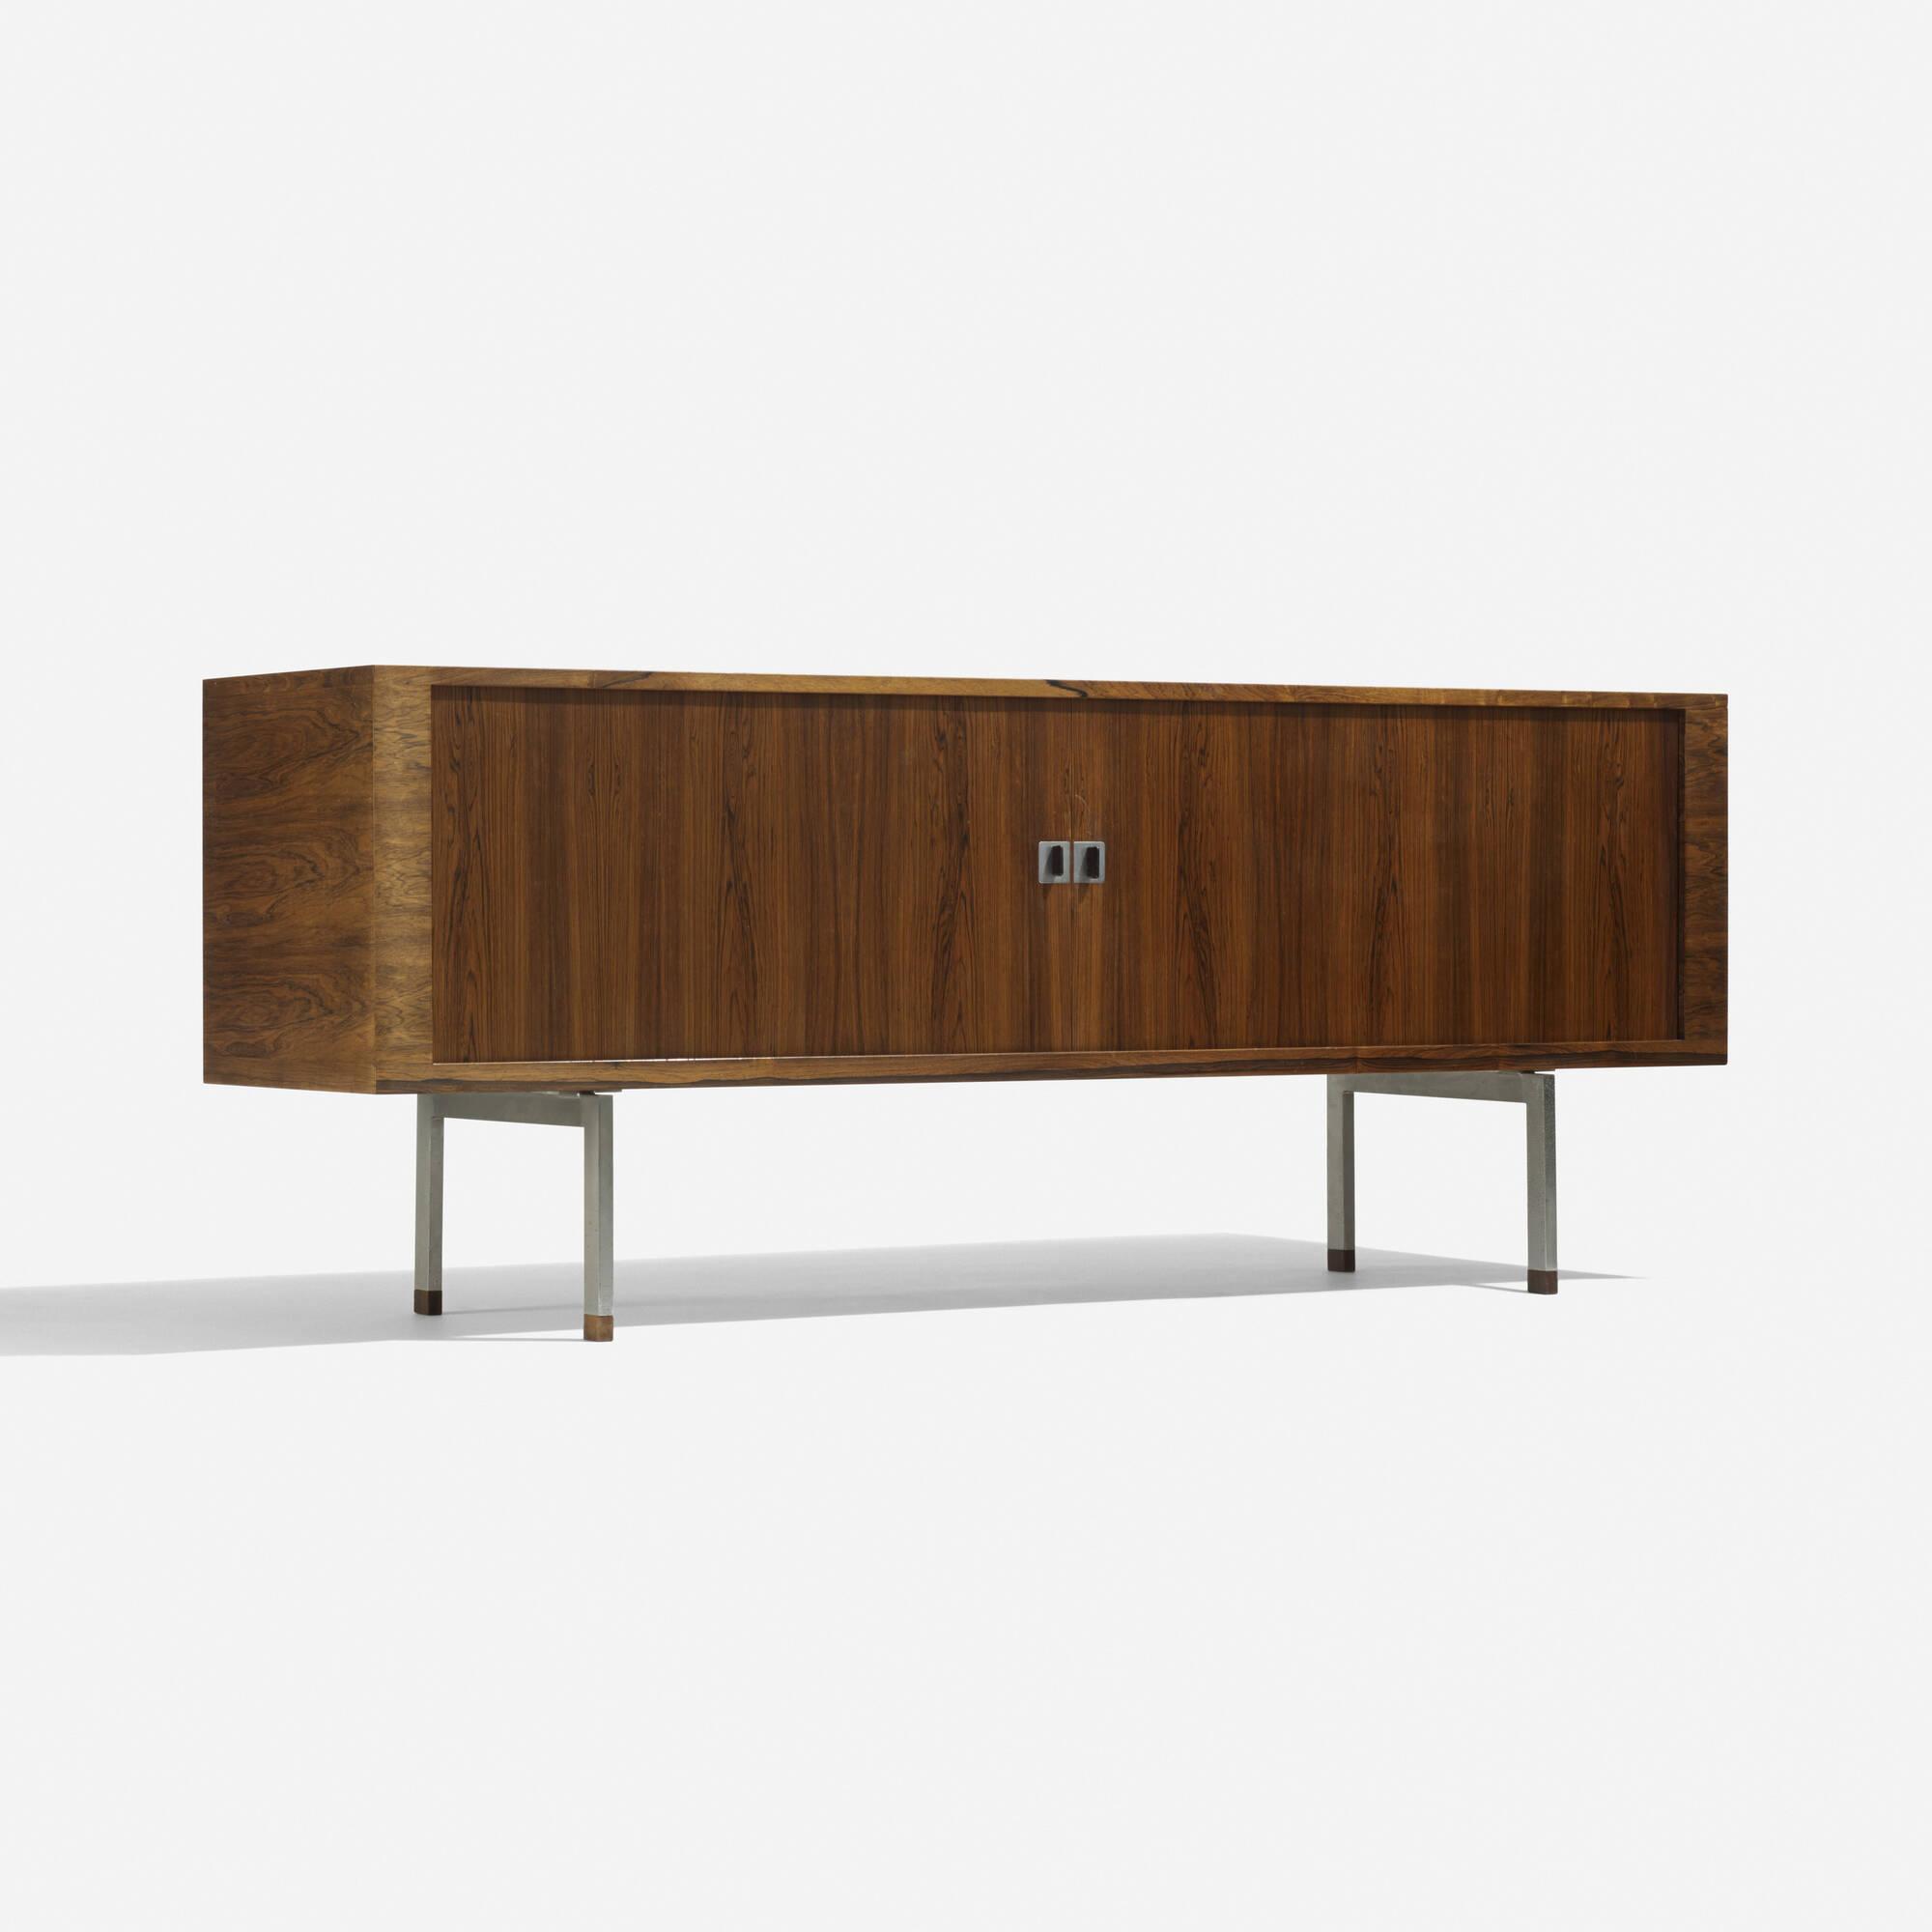 277: Hans J. Wegner / cabinet, model RY25 (1 of 4)